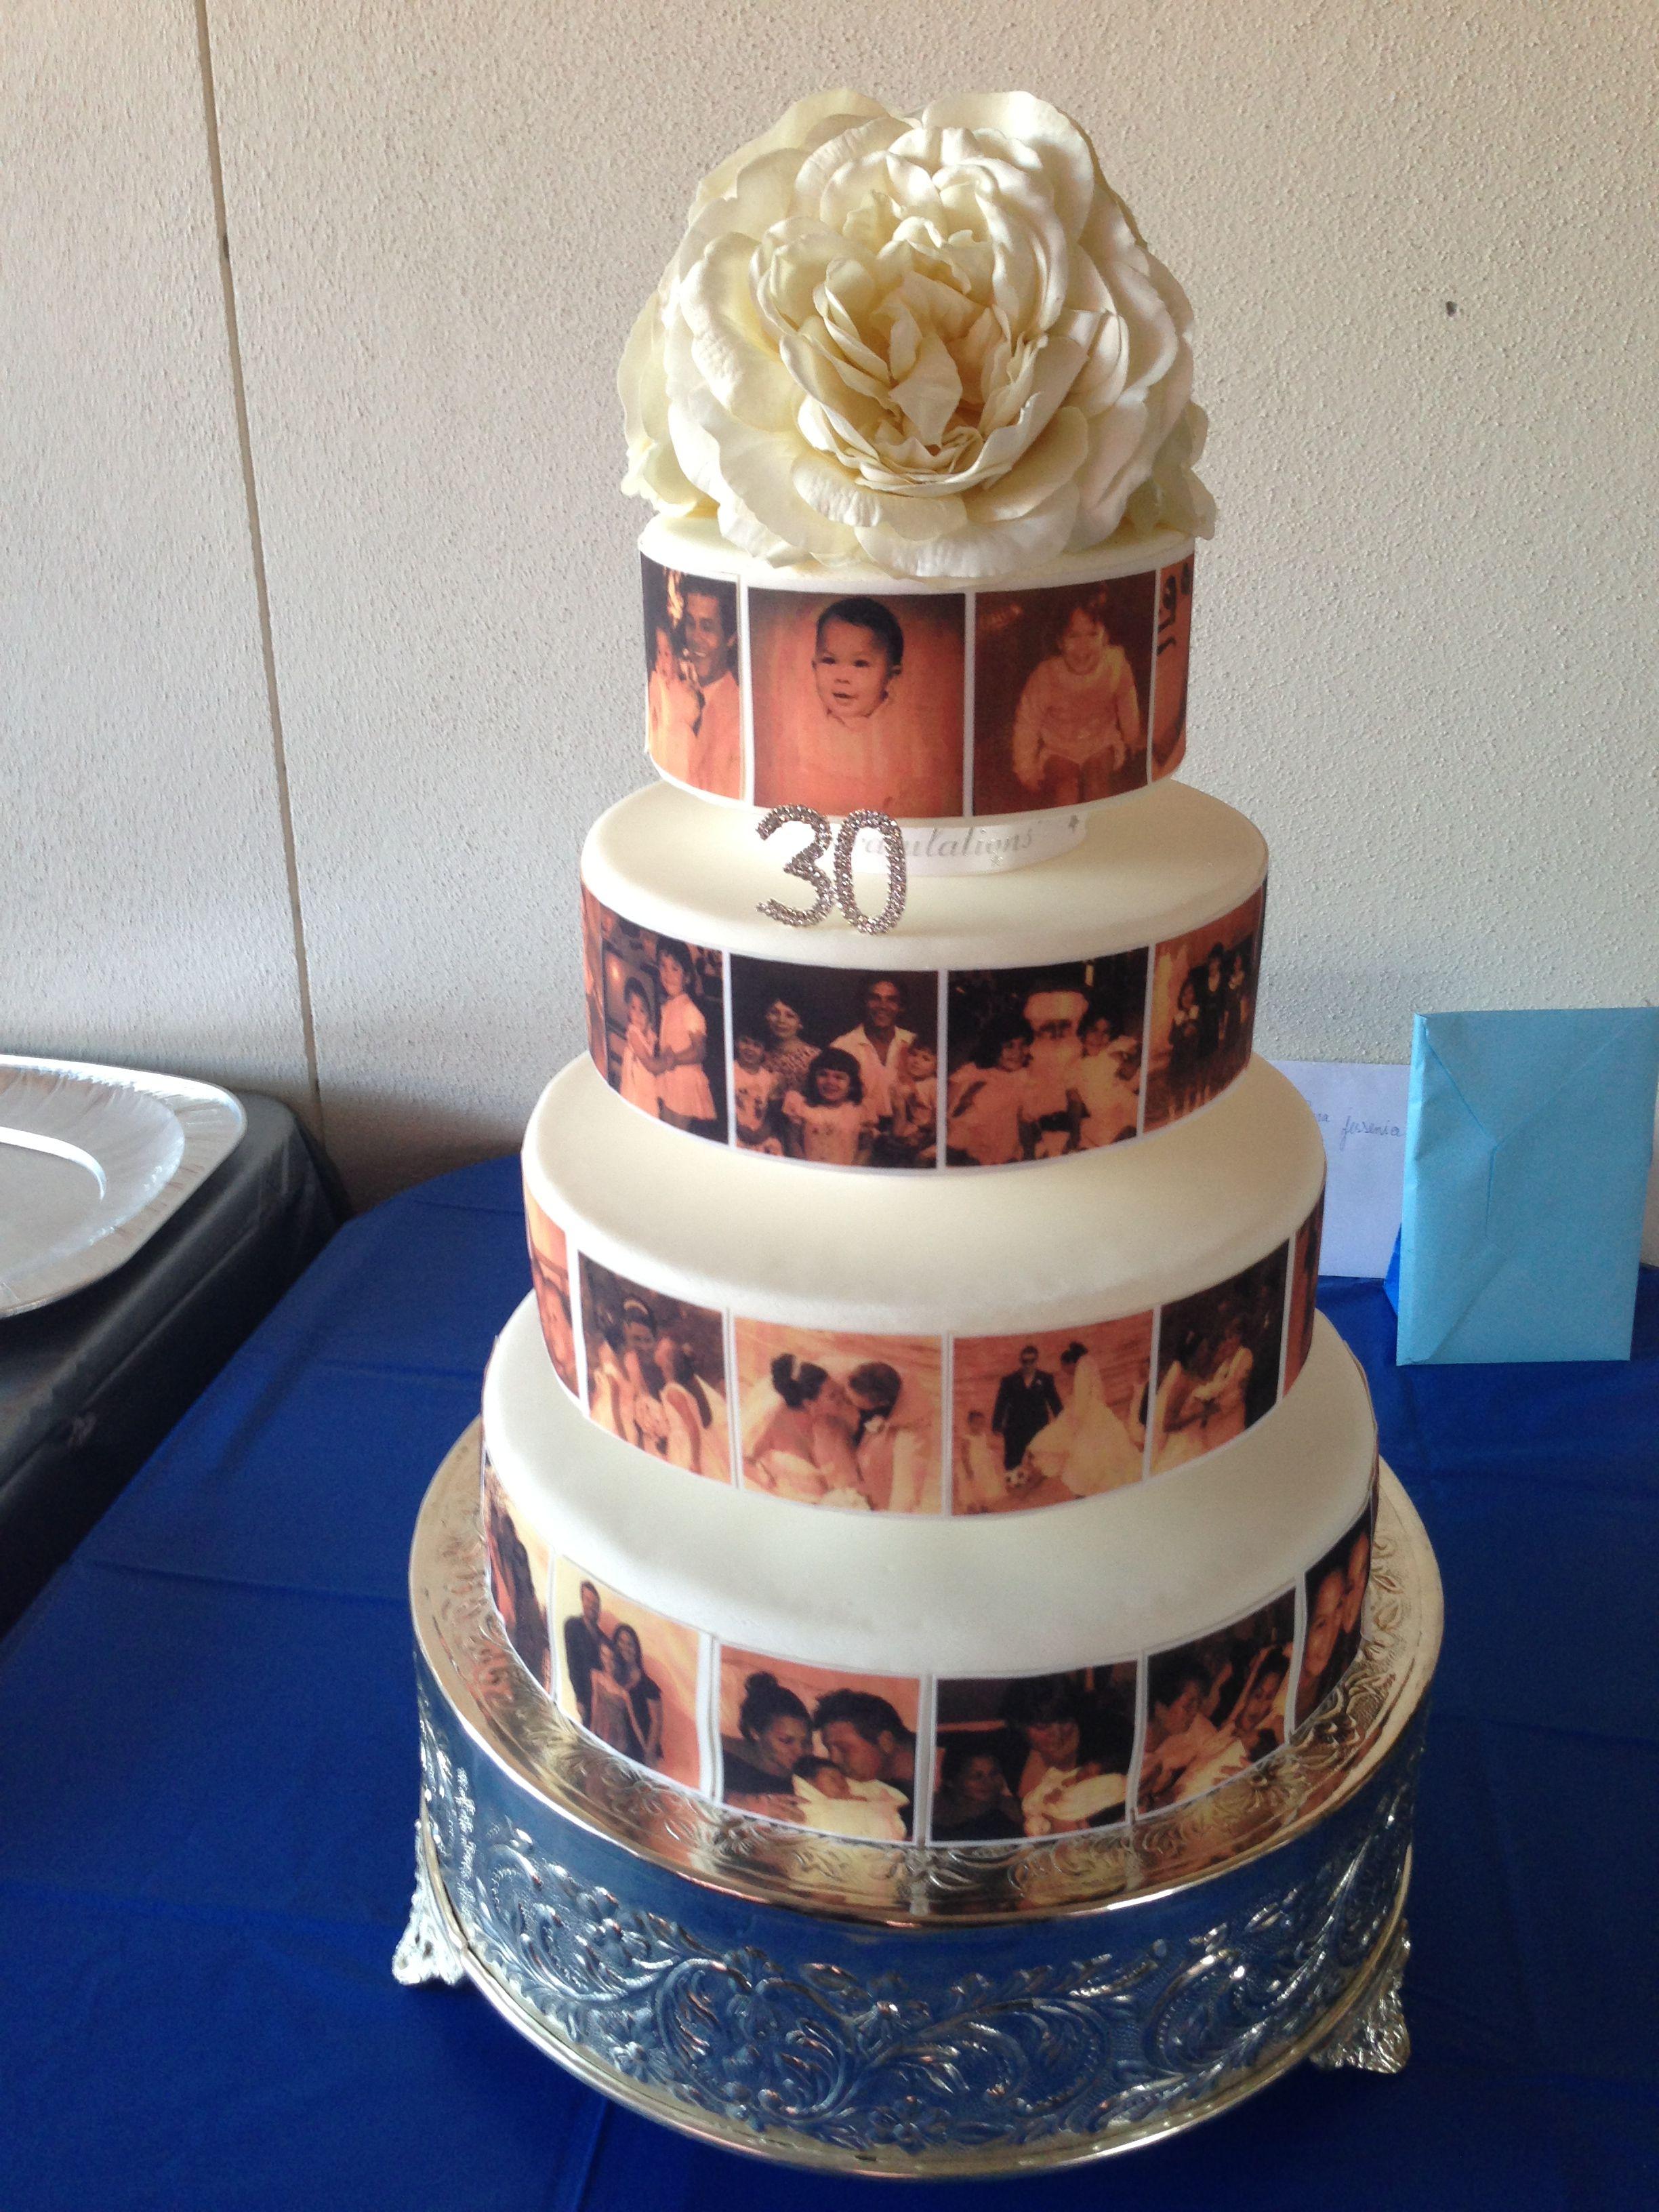 30th birthday cake by cake a bow brisbane australia